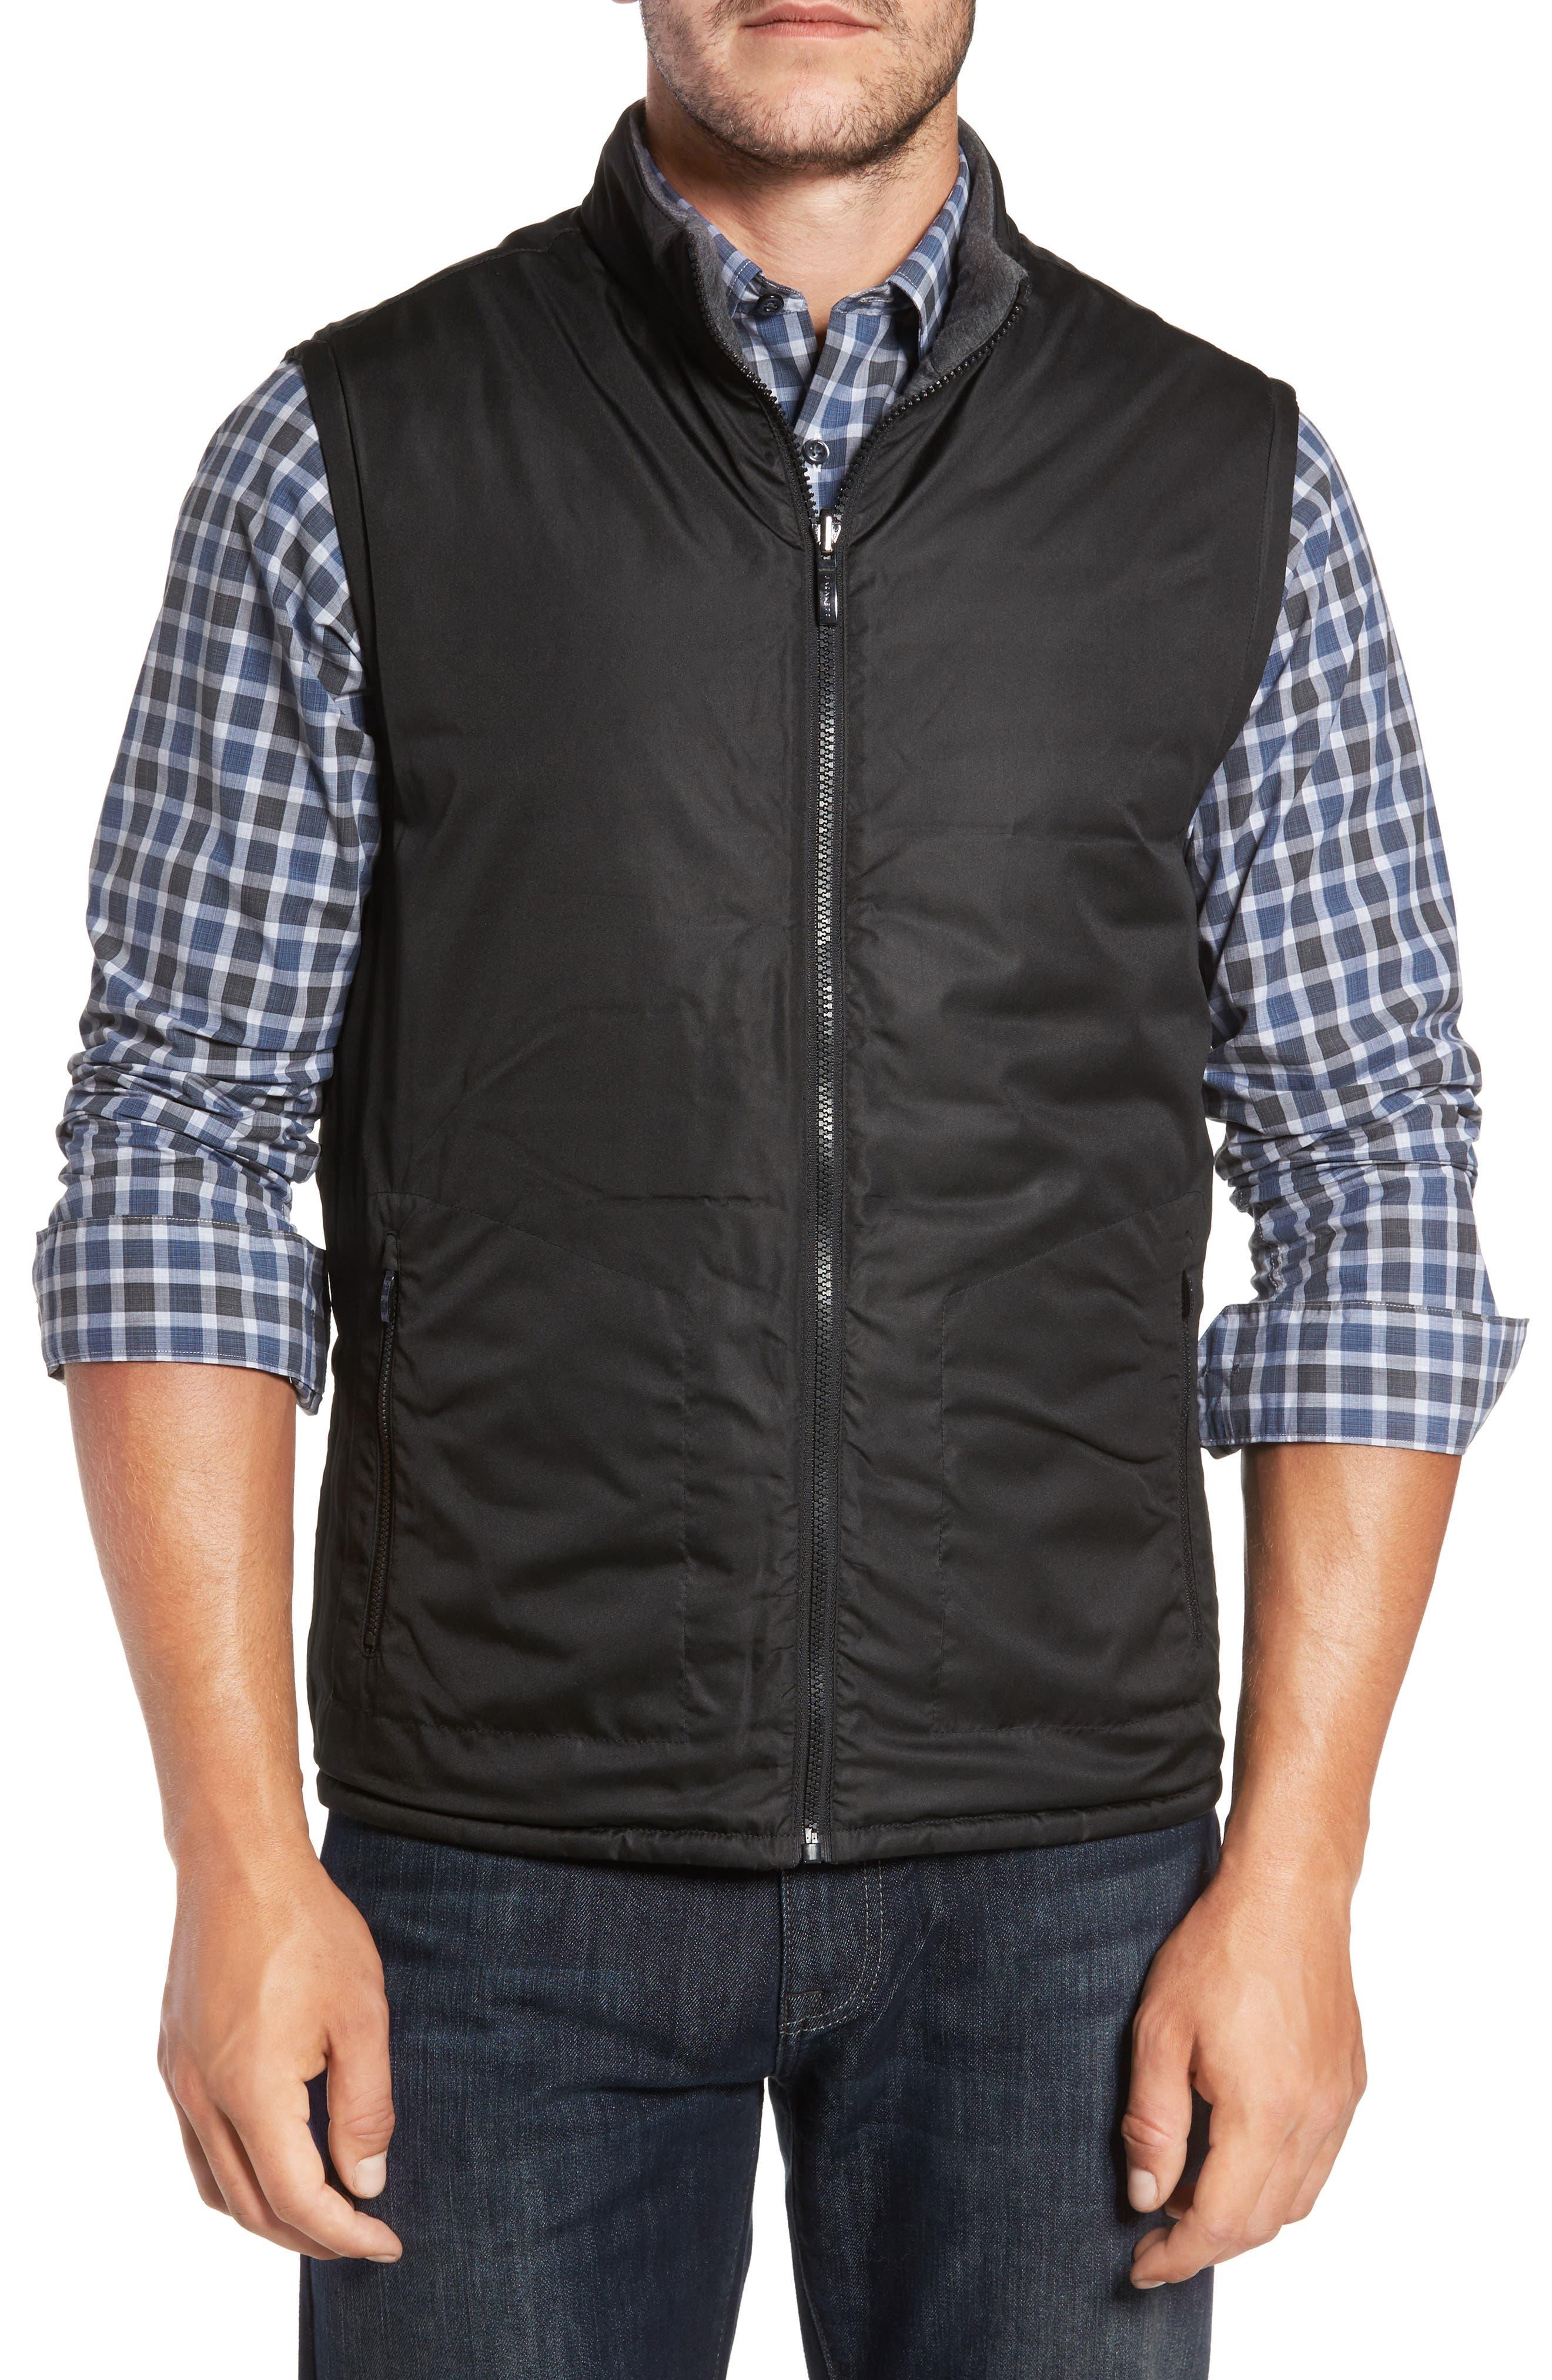 Gallagher Reversible Vest,                             Alternate thumbnail 2, color,                             Charcoal